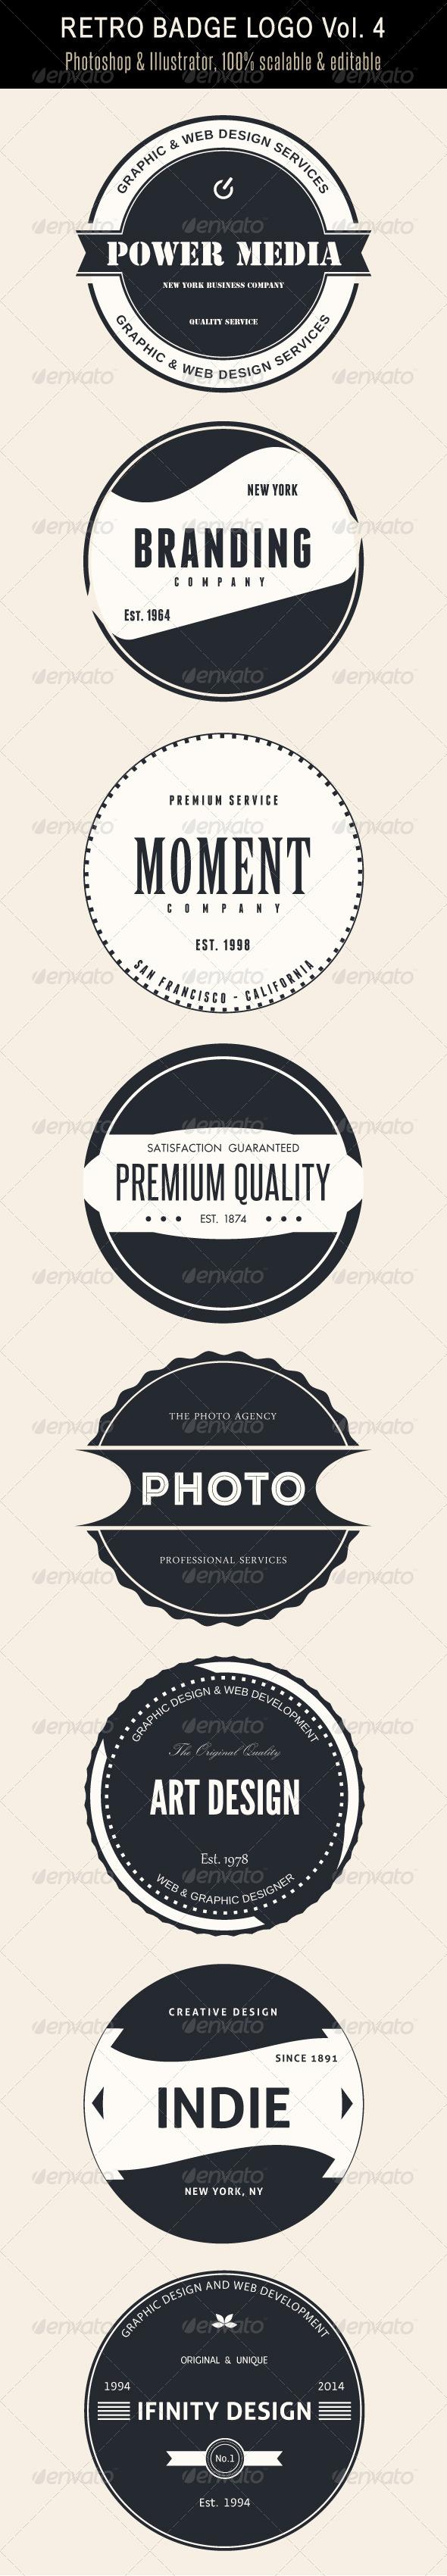 GraphicRiver Retro Badge Logo Vol 4 7374350